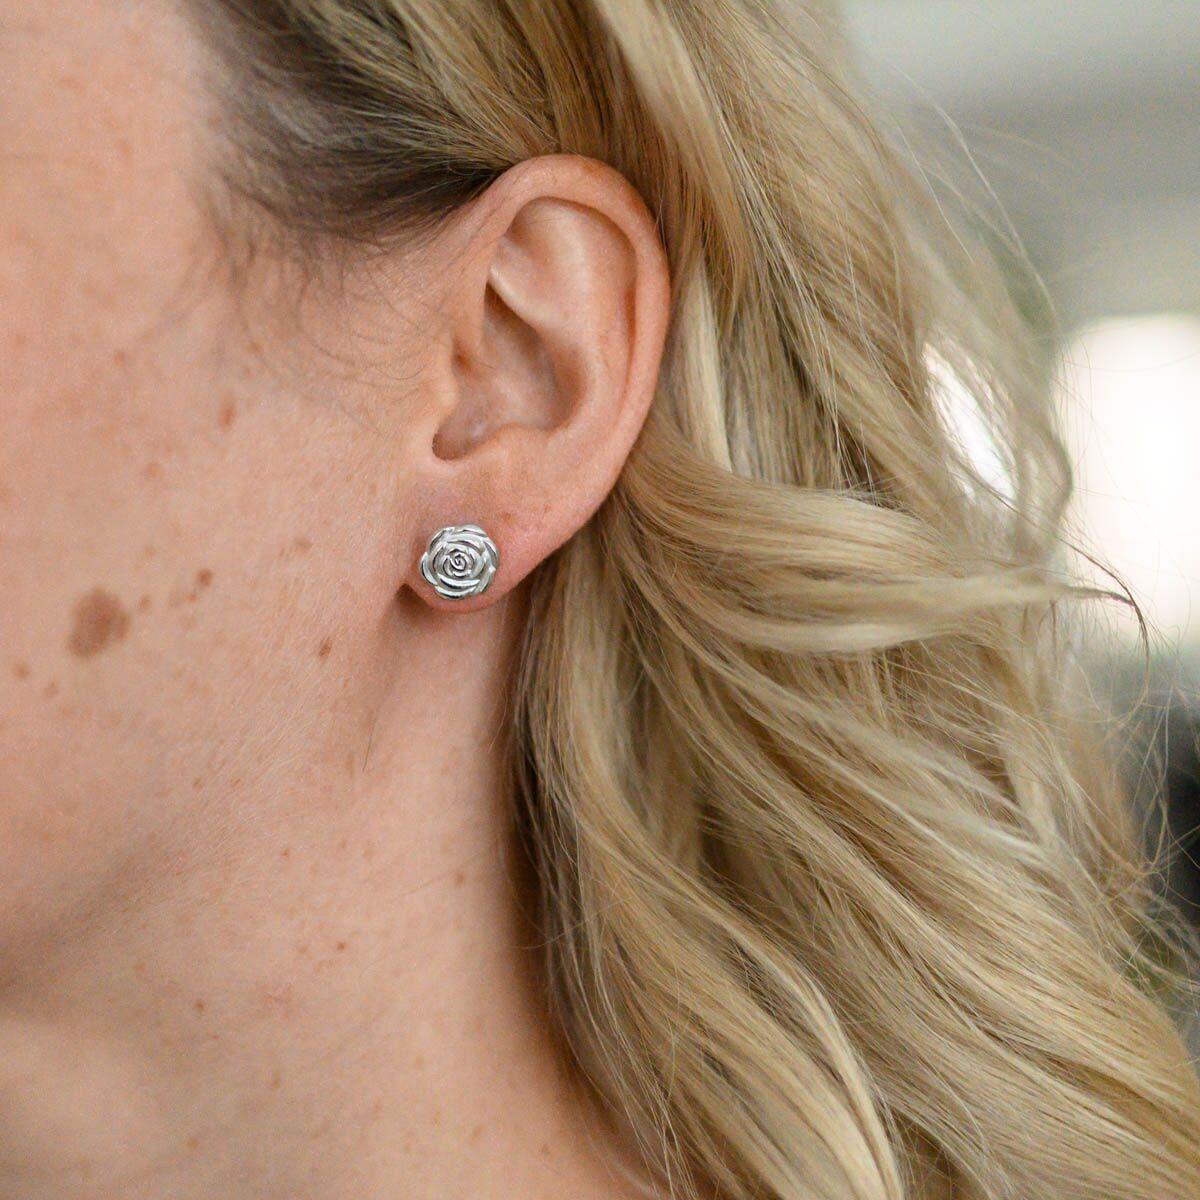 Edelstahl Ohrstecker Ohrringe Ohrschmuck Damen Kinder Vergold Silber Perlmutt